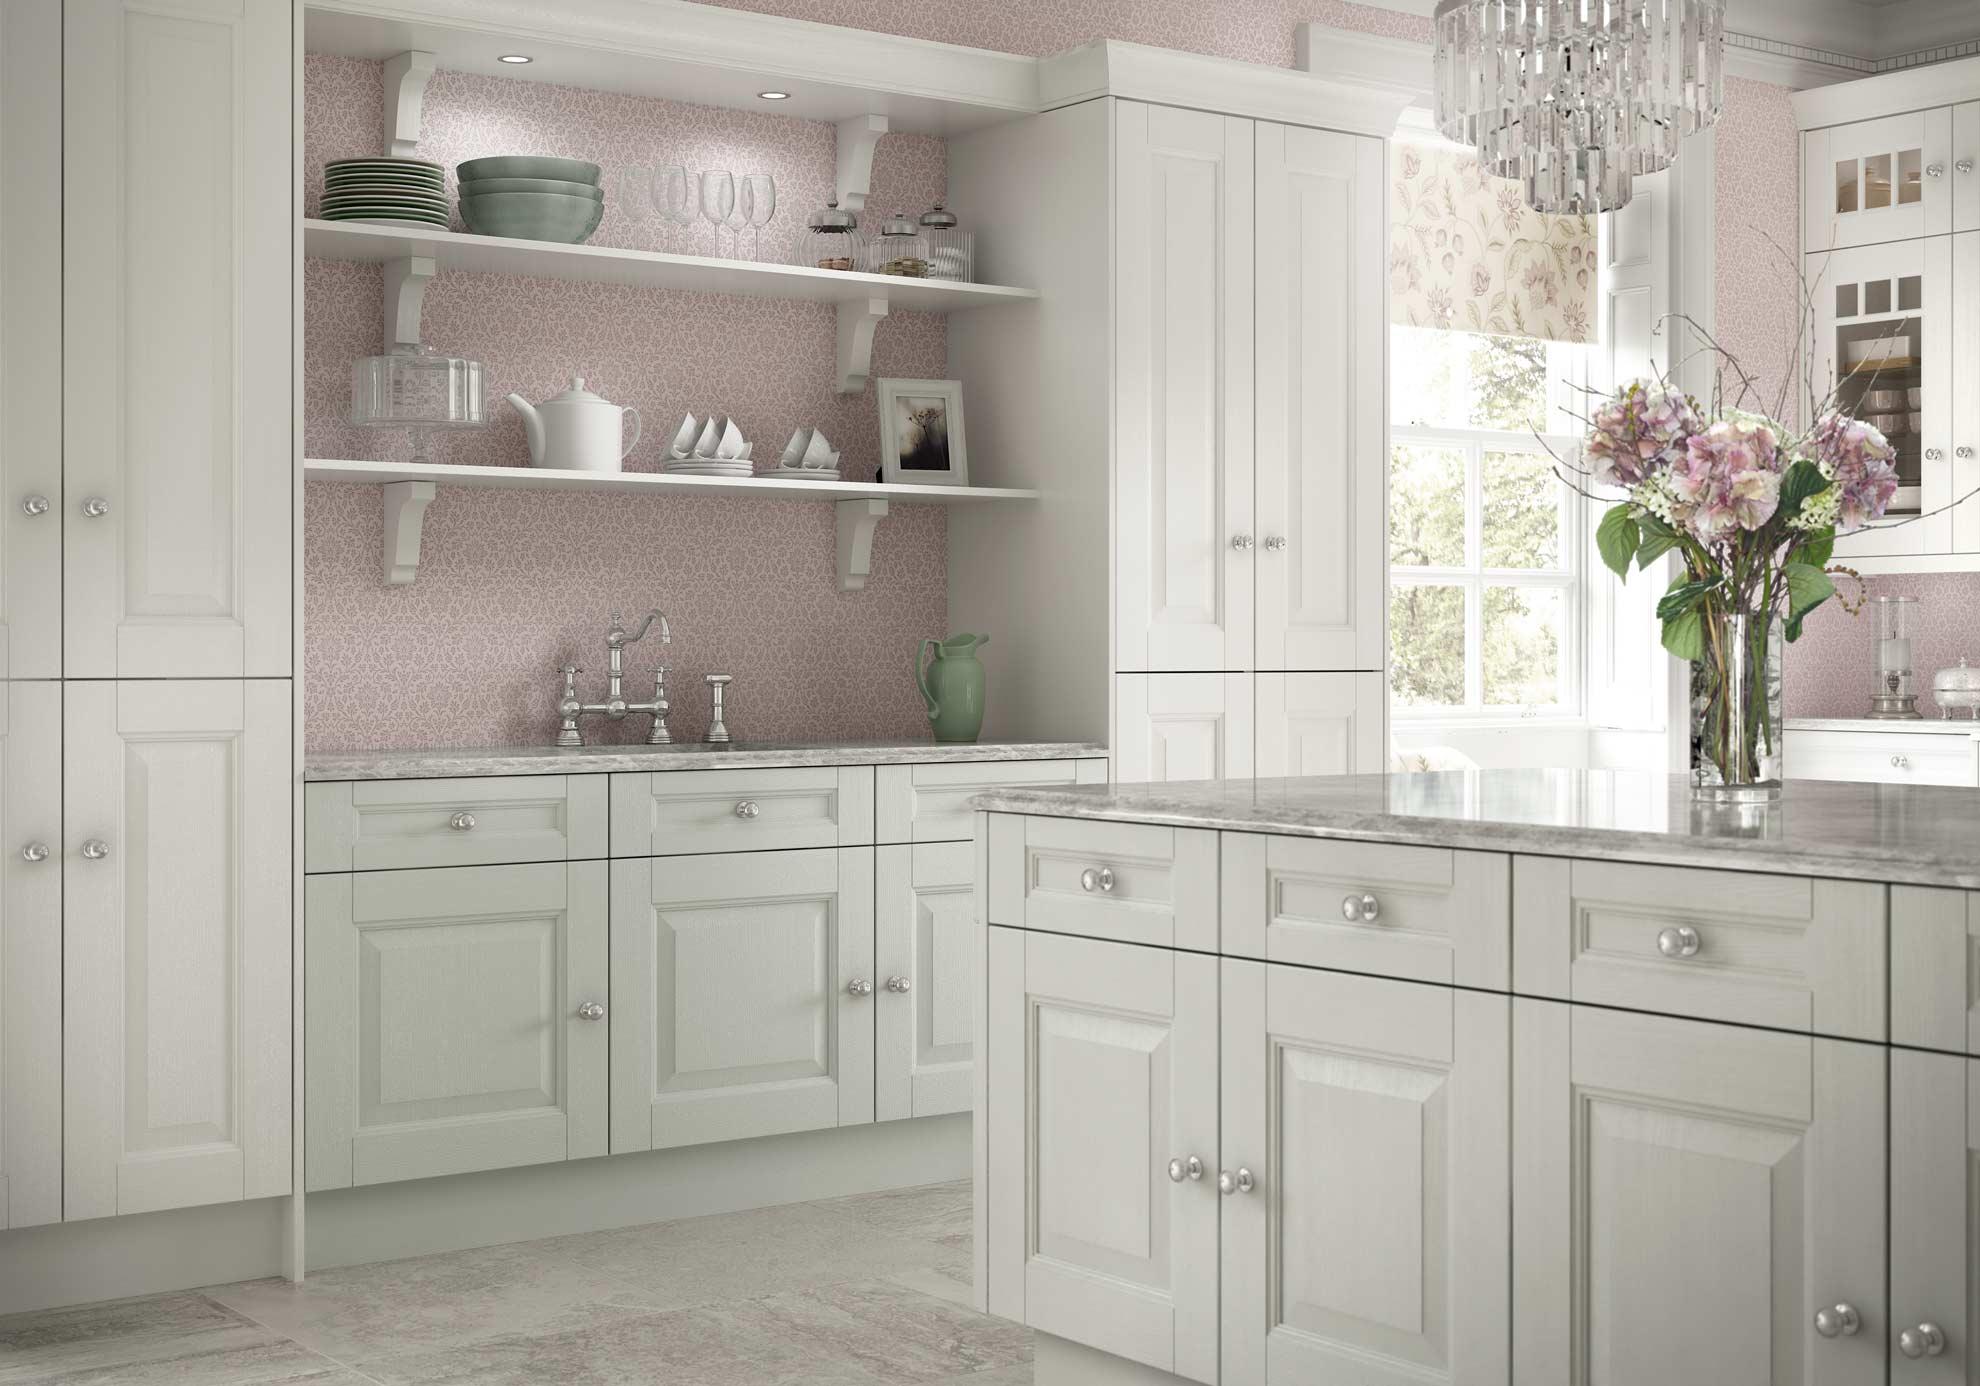 Kitchen renovation by Holme Design